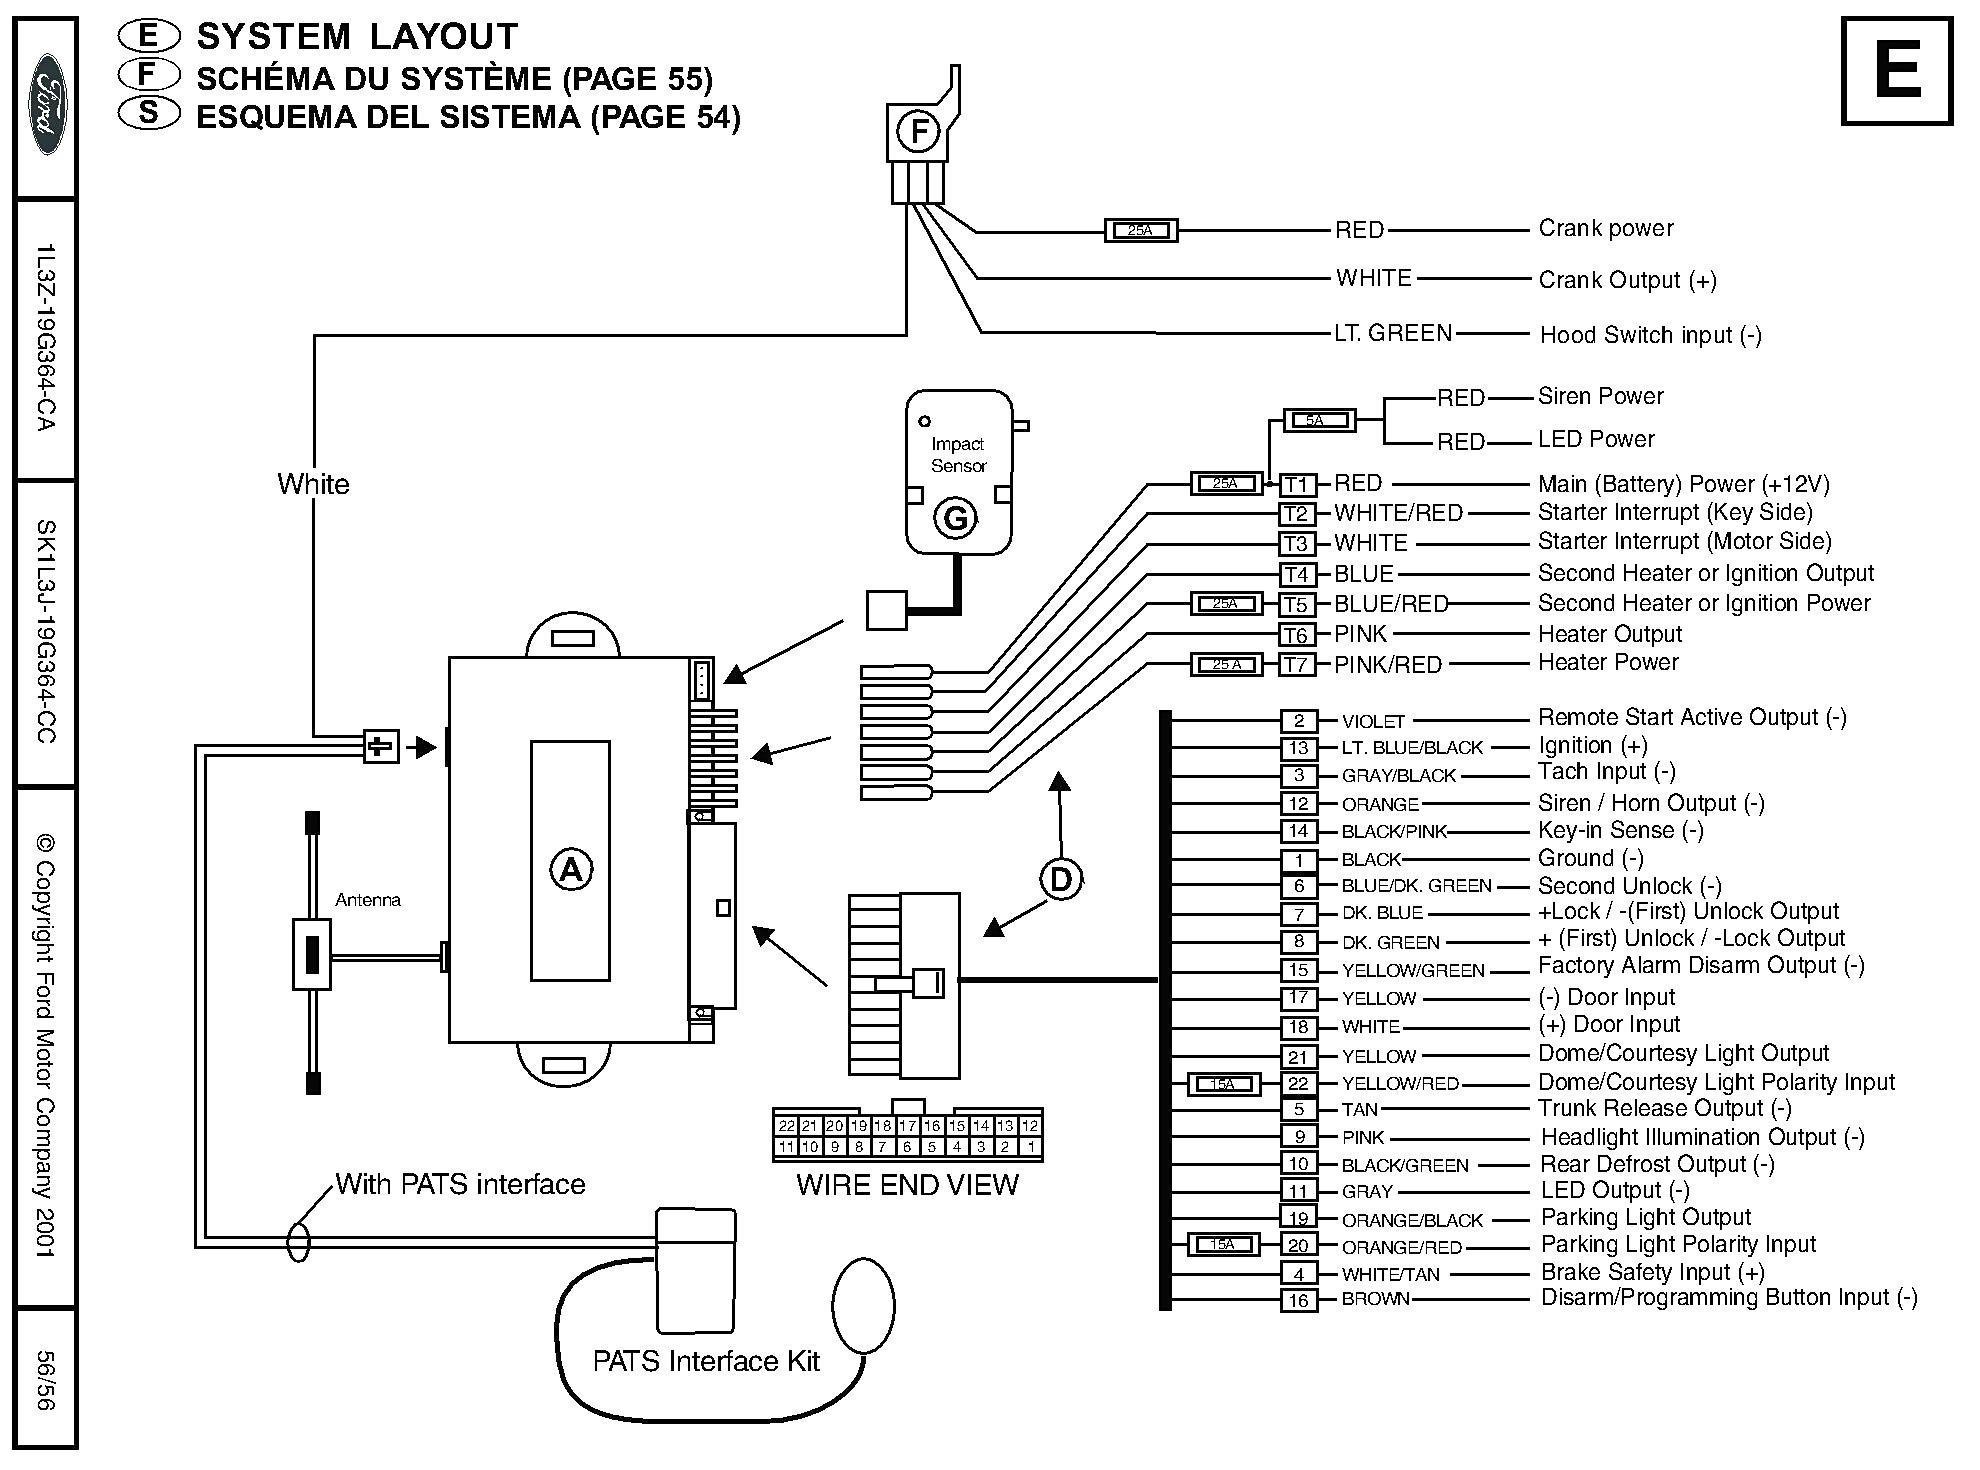 5706 Viper Alarm Wiring Diagram Vy 1903] Wiring Diagram In Addition Viper Remote Start Of 5706 Viper Alarm Wiring Diagram